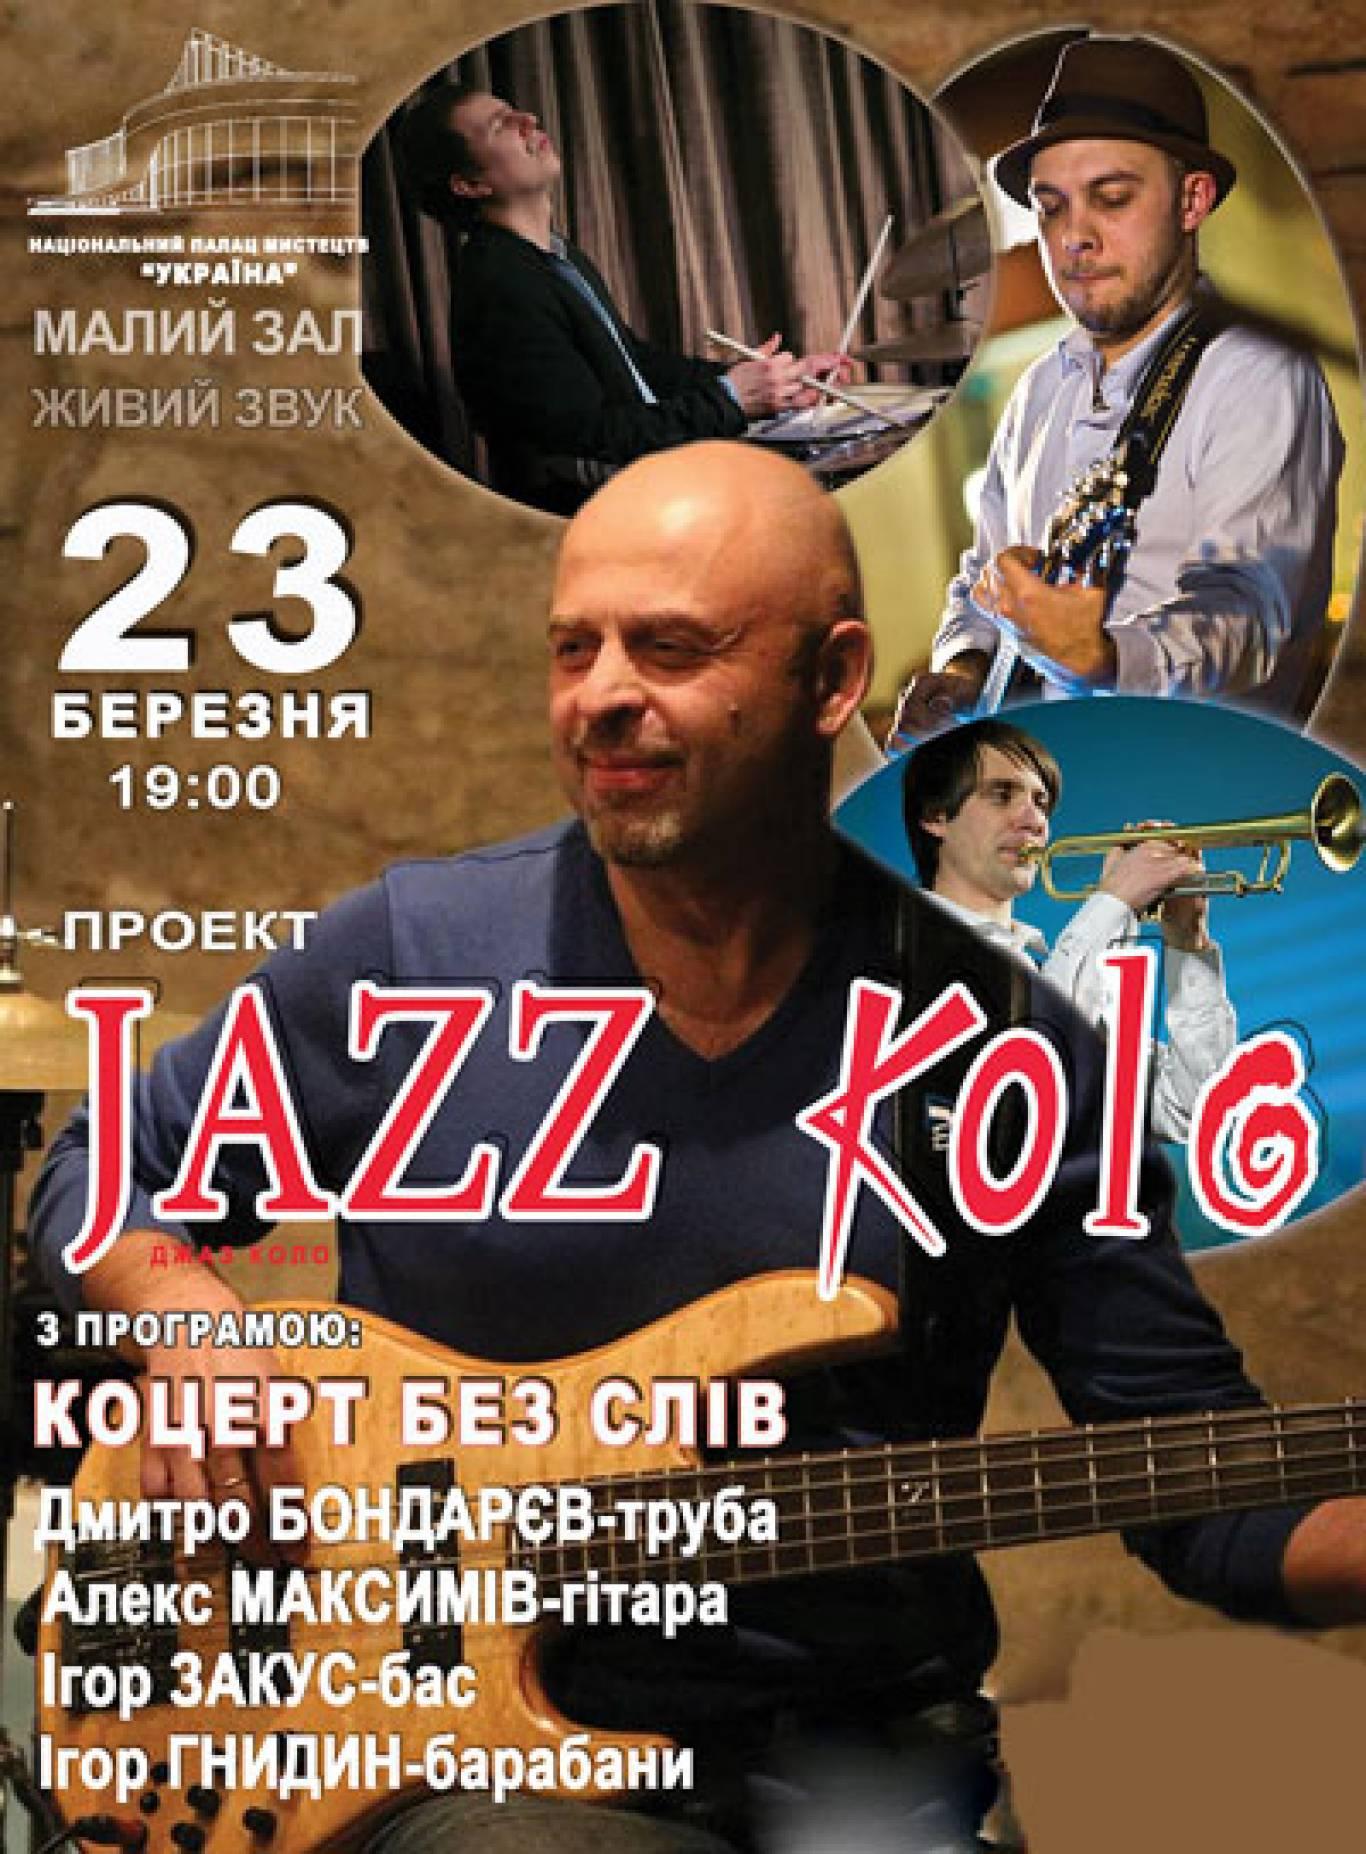 Концерт JAZZ KOLO